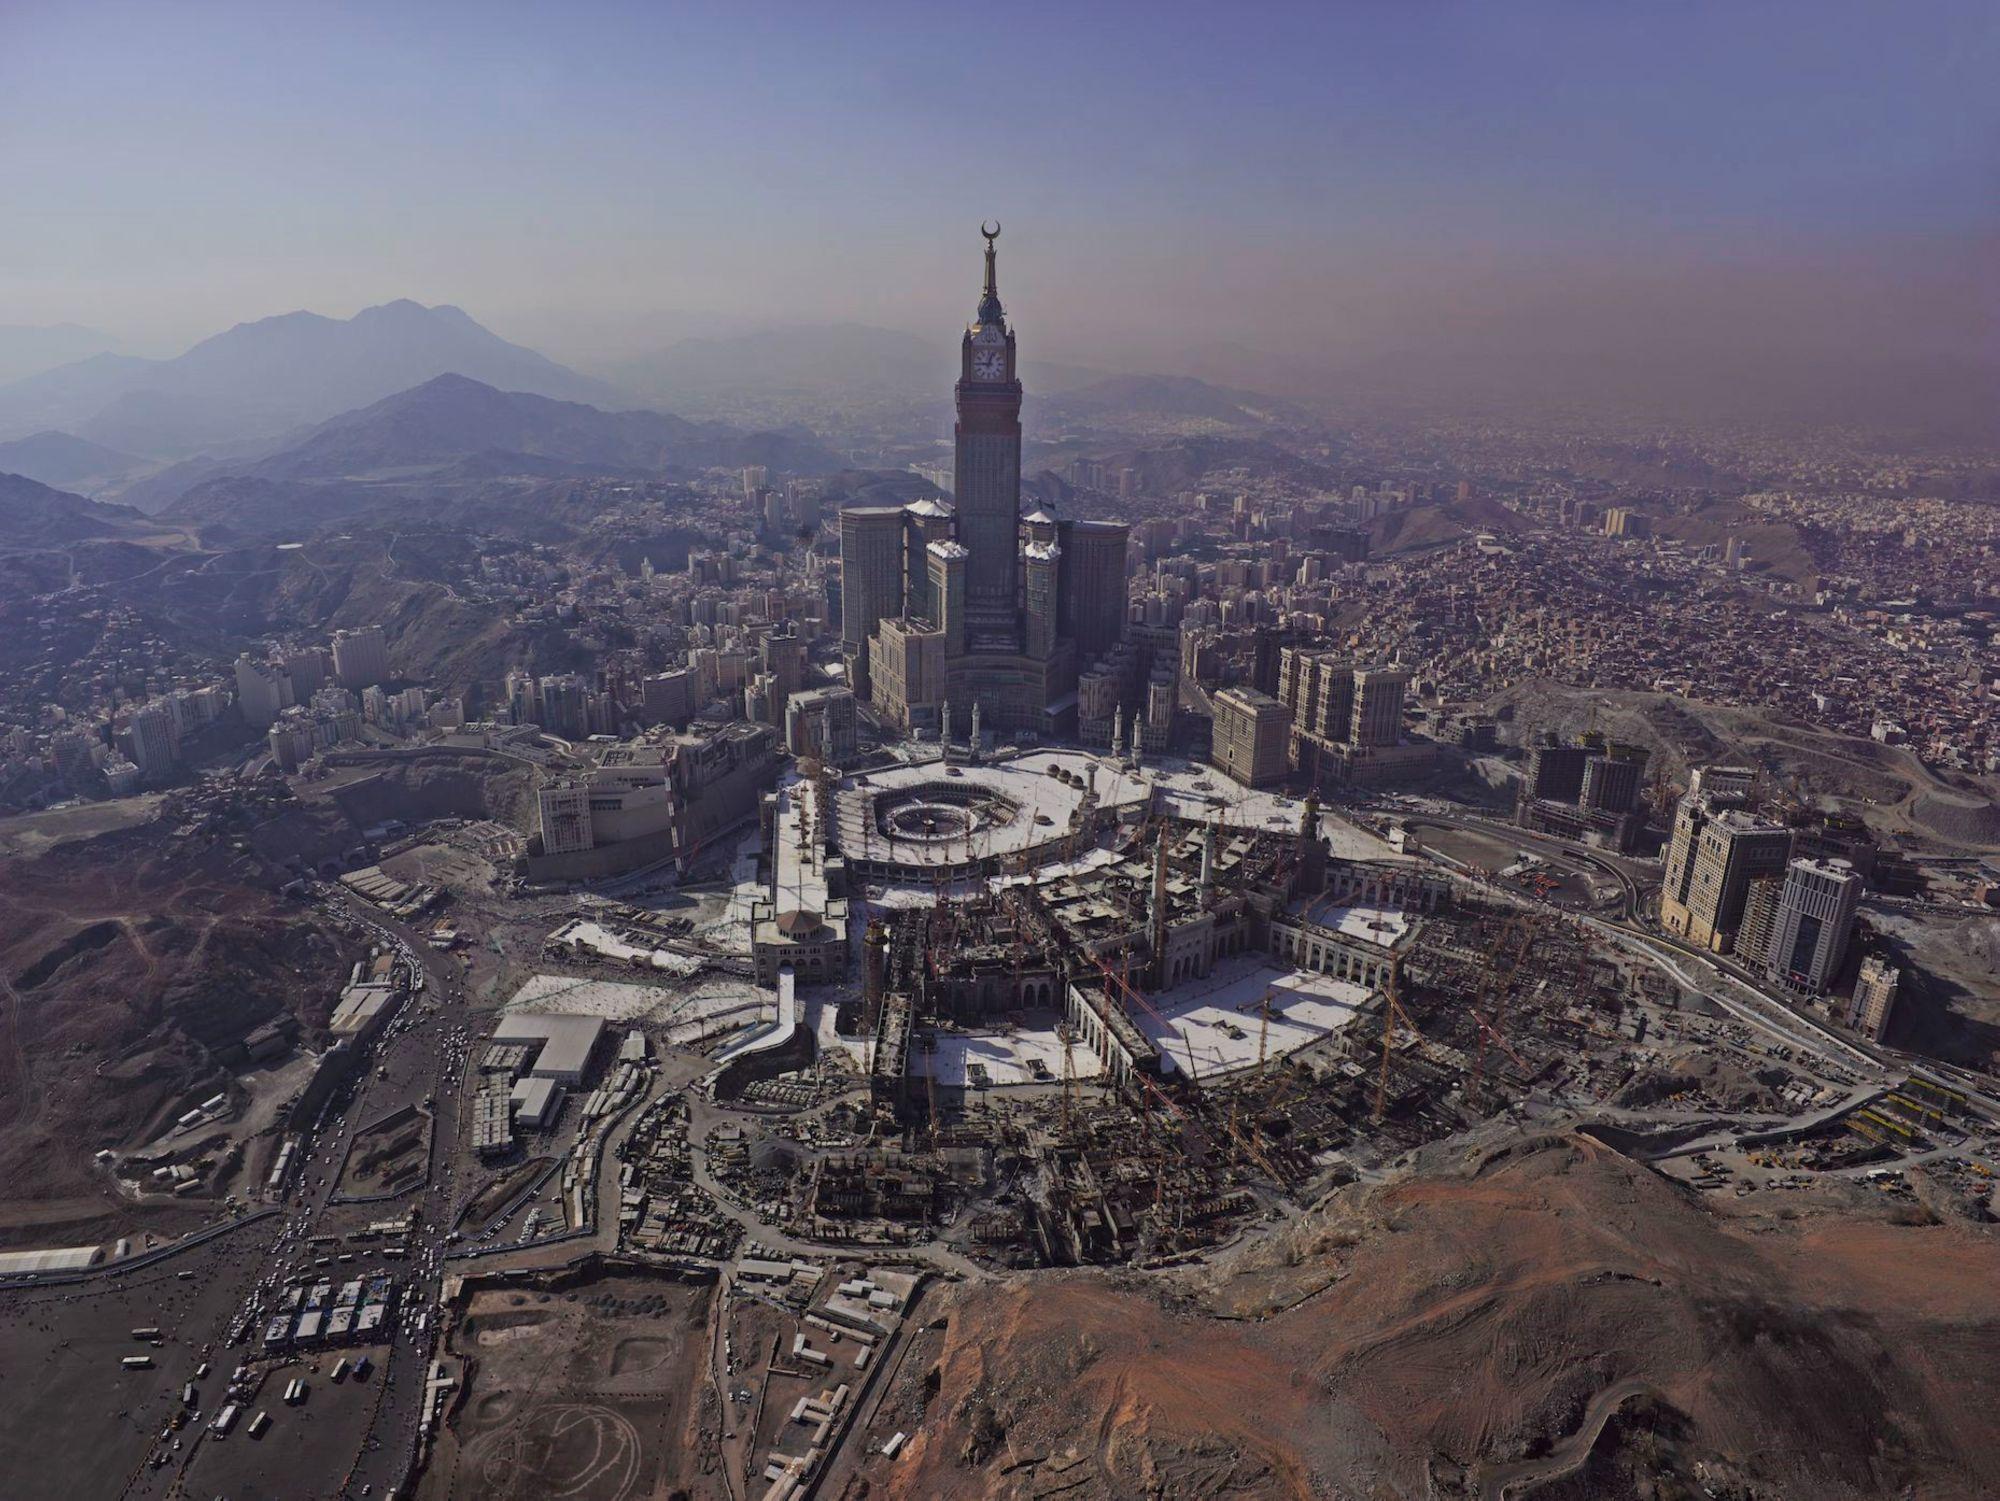 Ahmed Mater (Saudi, born 1979). Metropolis, 2013. Diasec mounted Latex jet print on Kodak Premier Paper, 118 x 88 ½ in. (300 x 225 cm). Courtesy of the artist. © Ahmed Mater